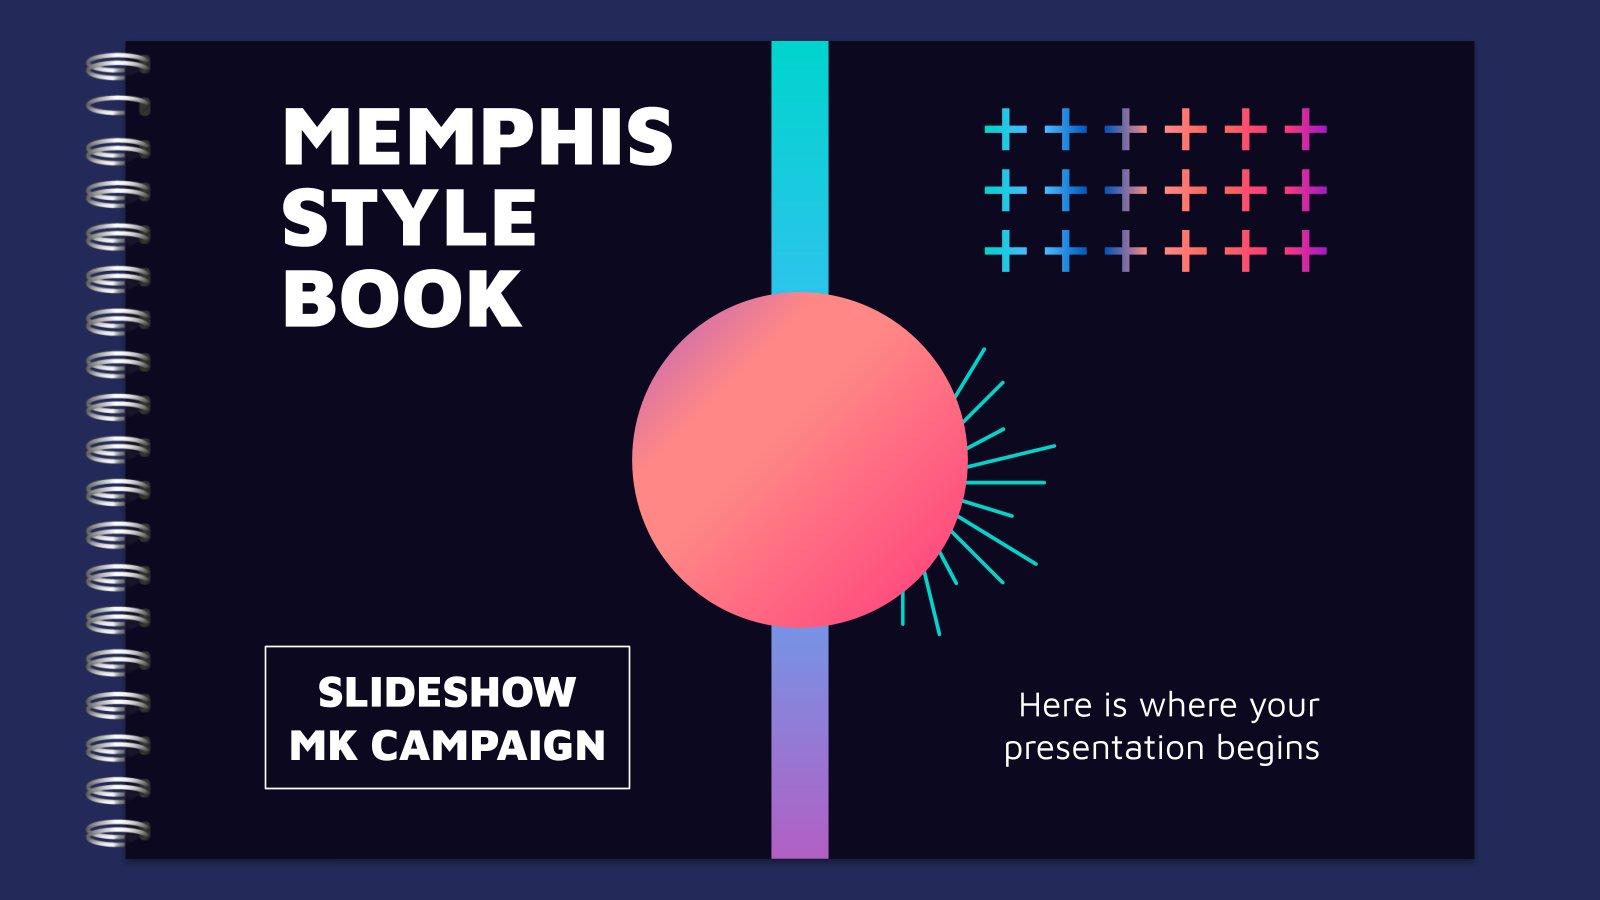 Memphis Style Book Slideshow MK Campaign presentation template